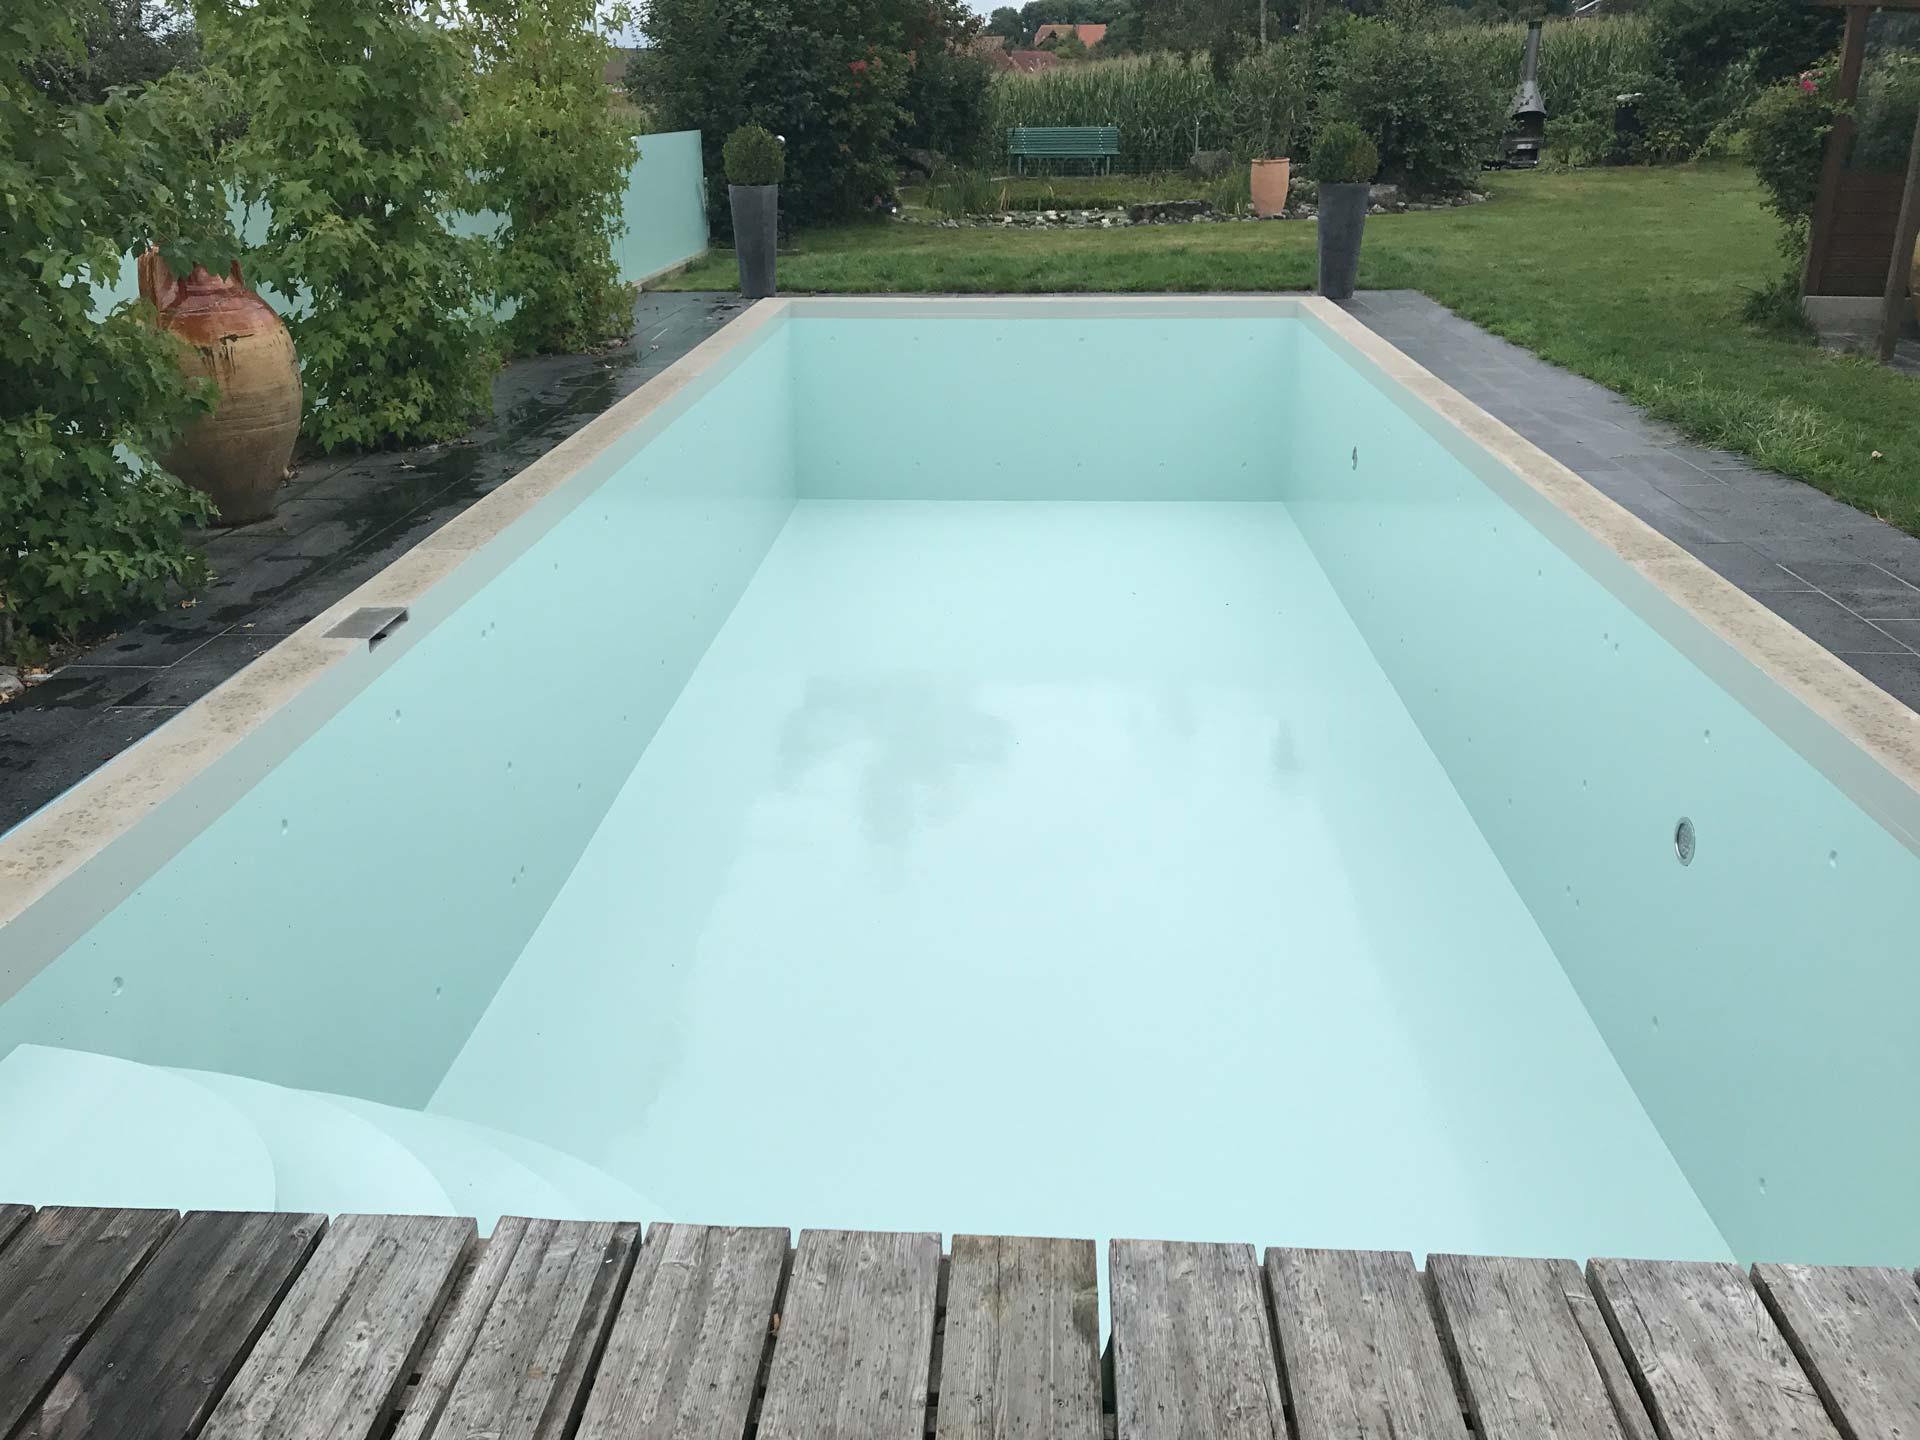 Poolbeschichtung | Neuenburgn | Wagner Maler GmbH